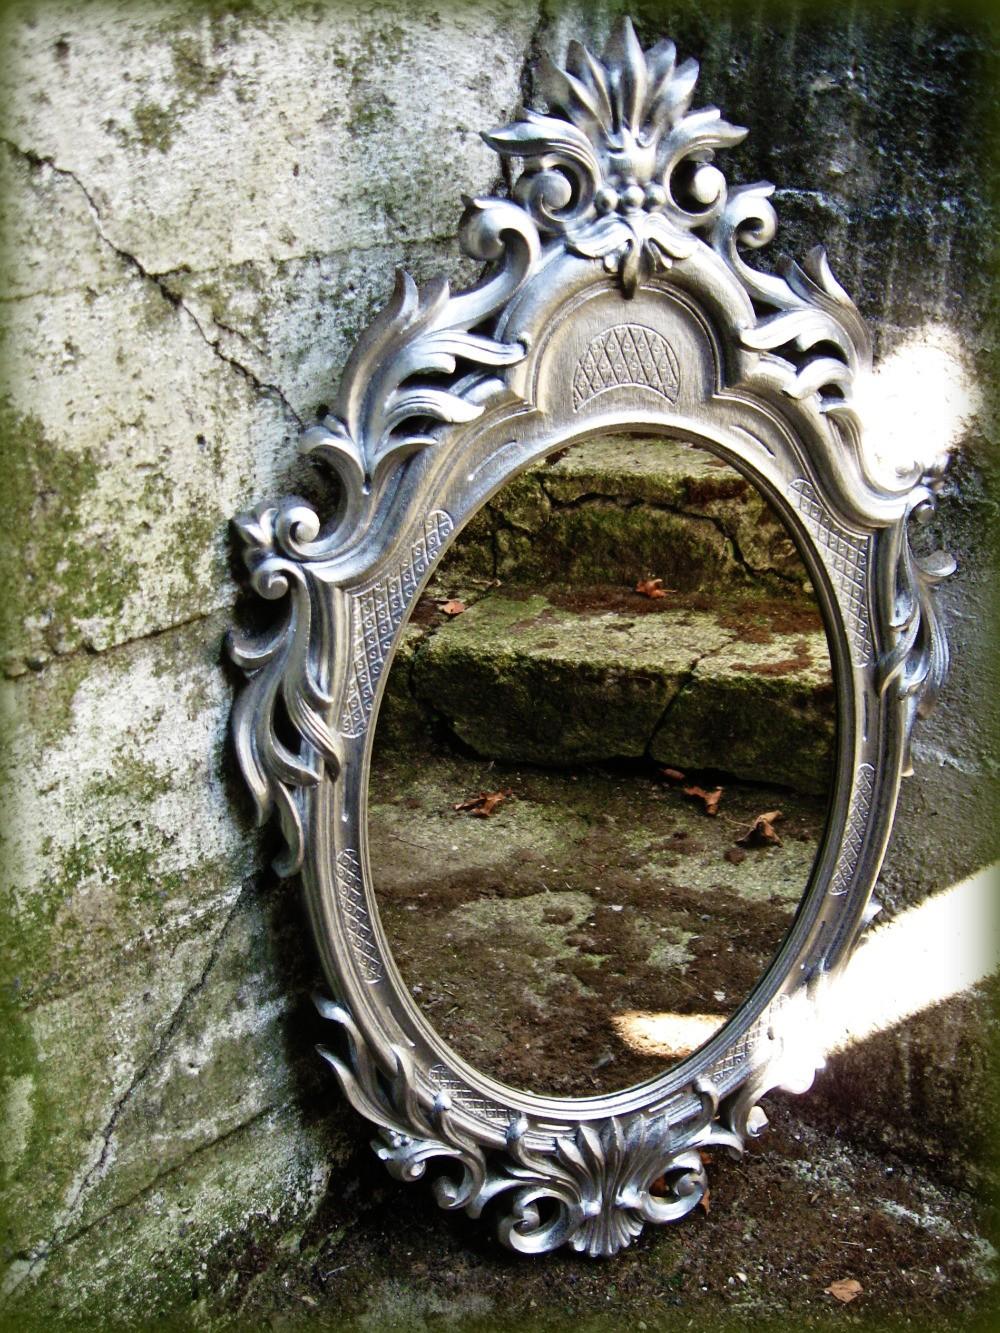 Spray Painting Mirrors 2 My Name Is Rasha إسمي رشا